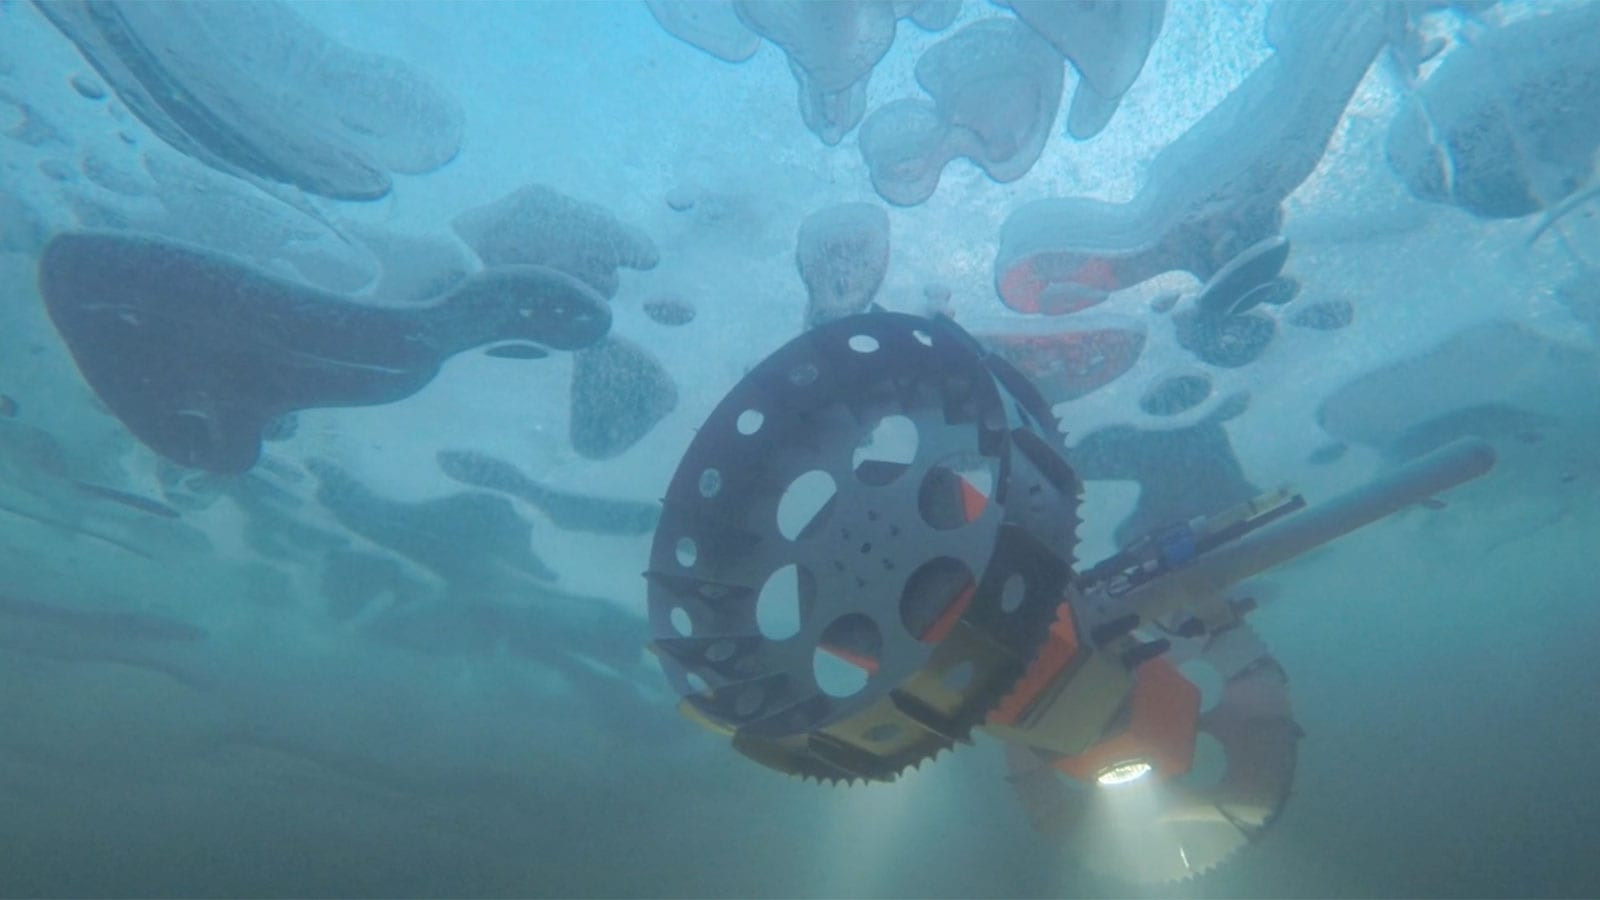 NANA BRUIE Antarctica space robot